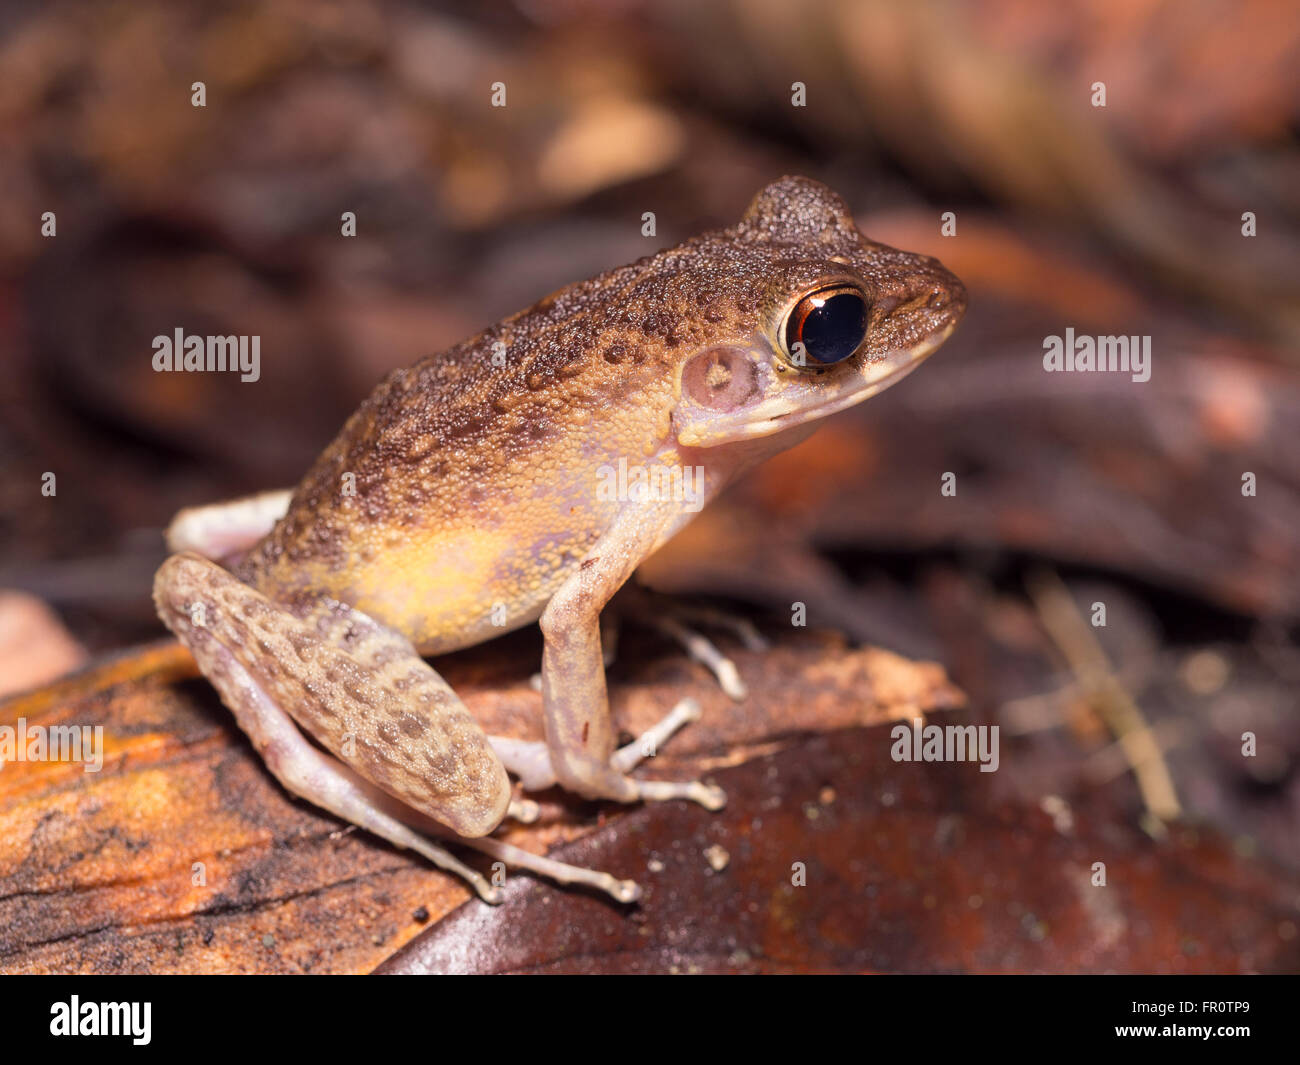 Borneo Brown Marsh Frog, Hylarana baramica Gunung Mulu, Borneo, Malaysia - Stock Image